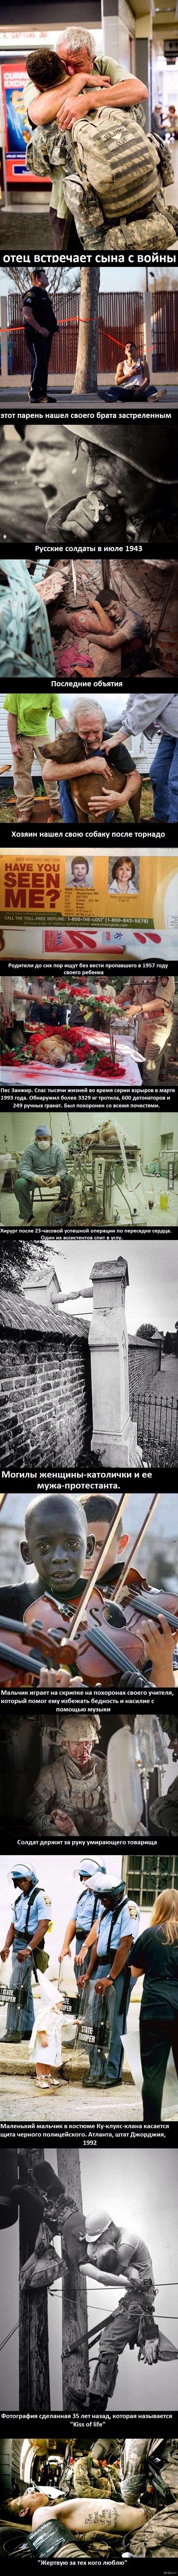 http://s.pikabu.ru/post_img/2013/12/28/12/1388259488_1299102874.jpg